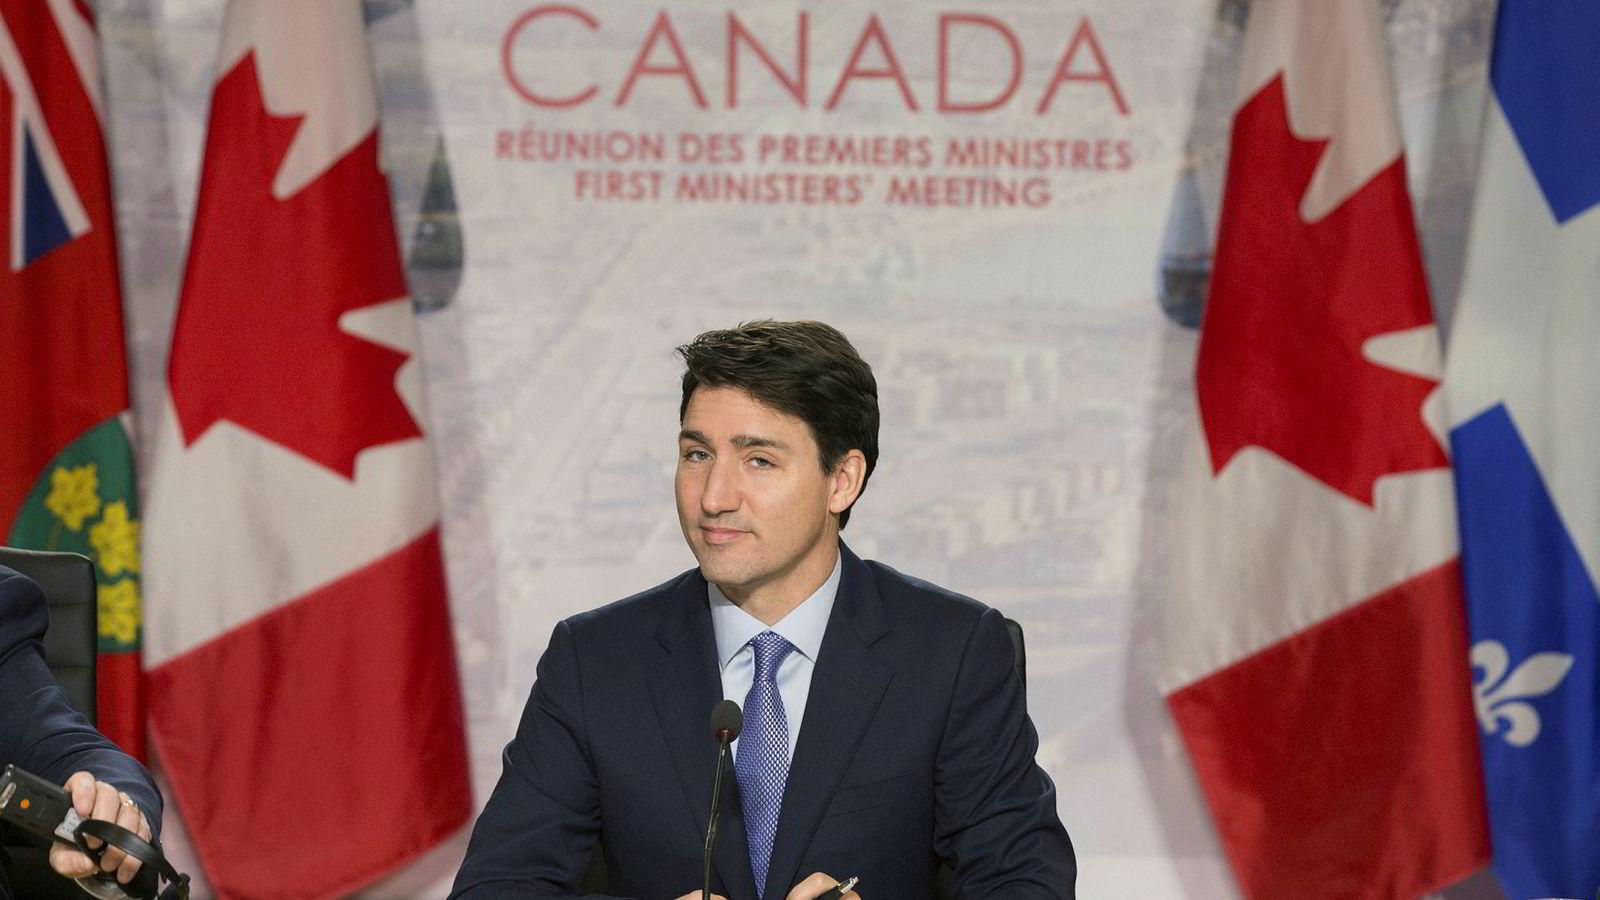 Statsminister Justin Trudeaus forhold til Saudi-Arabia er iskaldt.